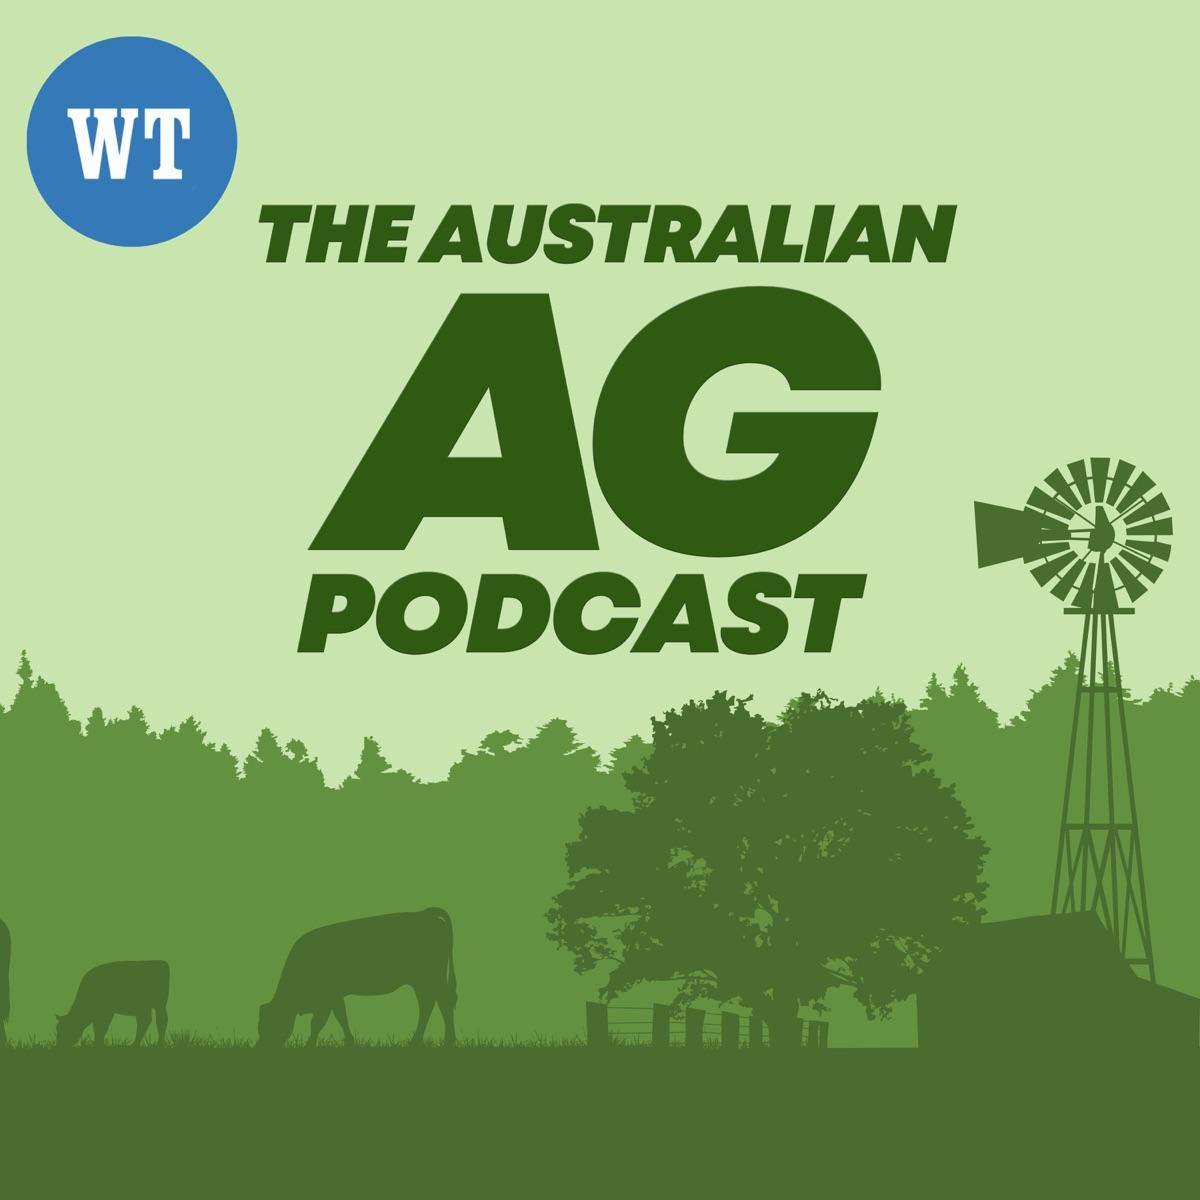 The Australian Ag Podcast